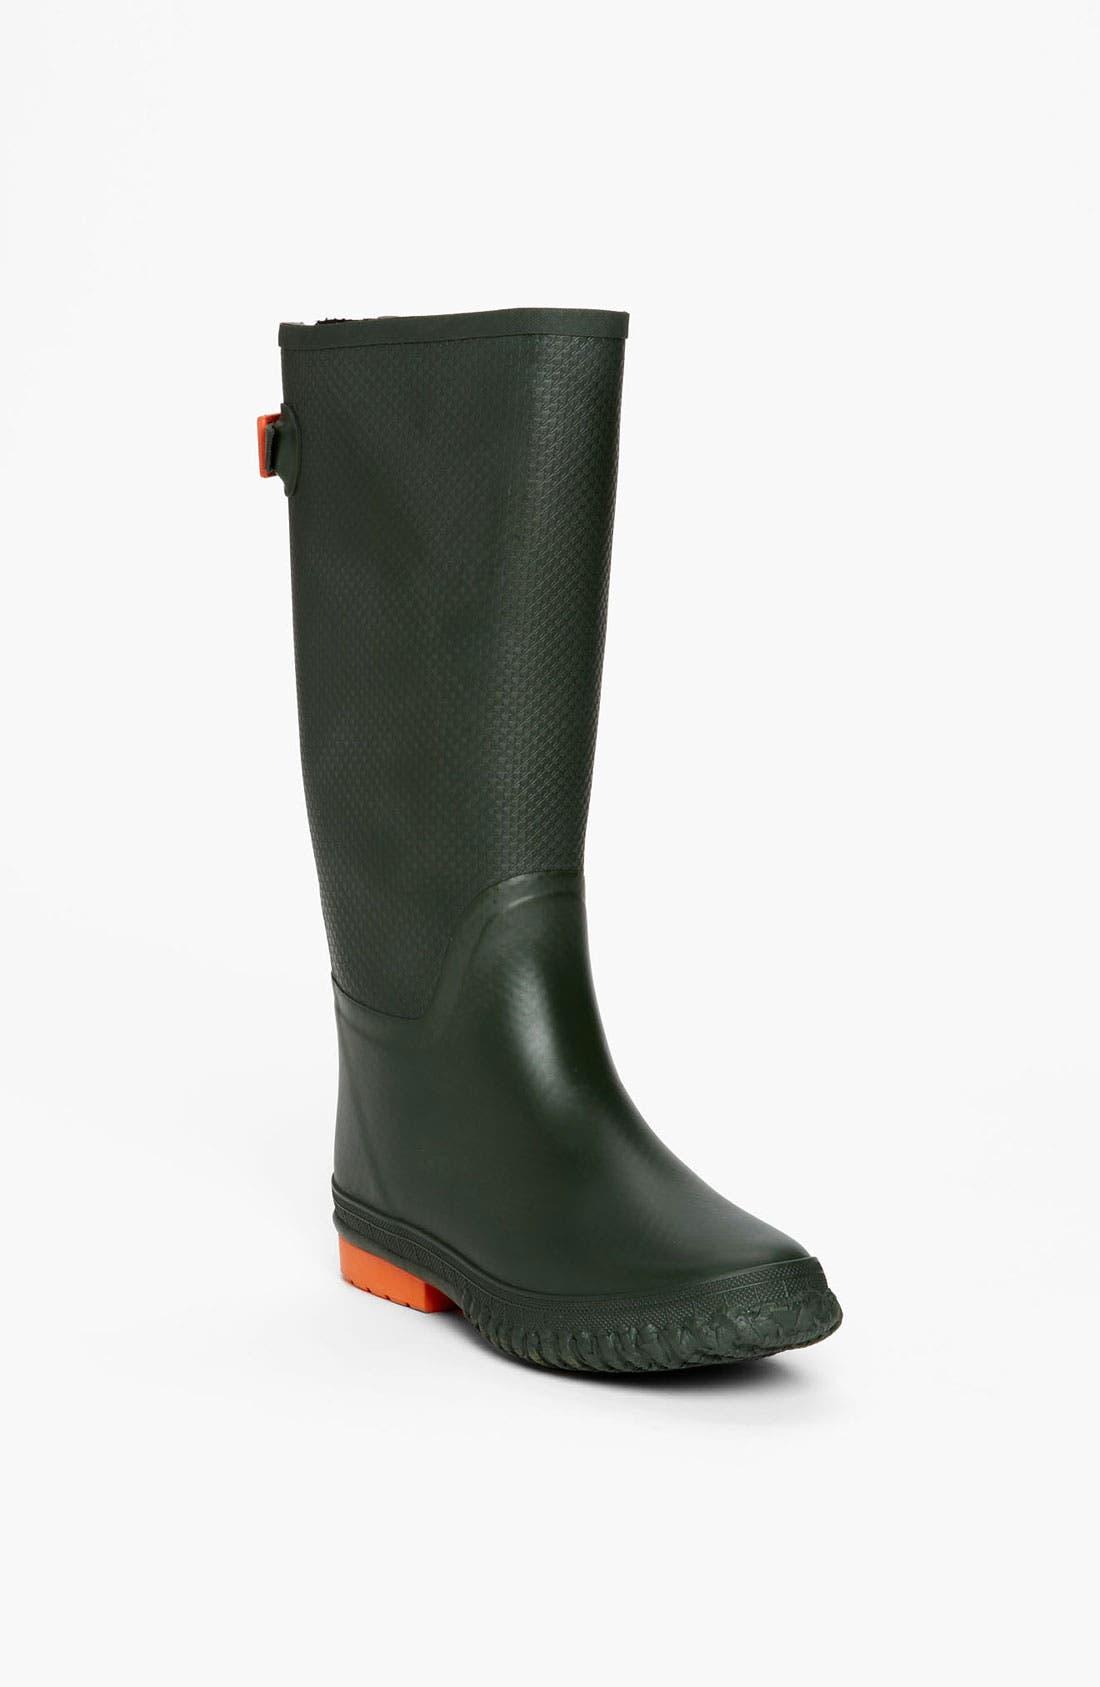 Main Image - Tretorn 'Emelie' Rain Boot (Women)